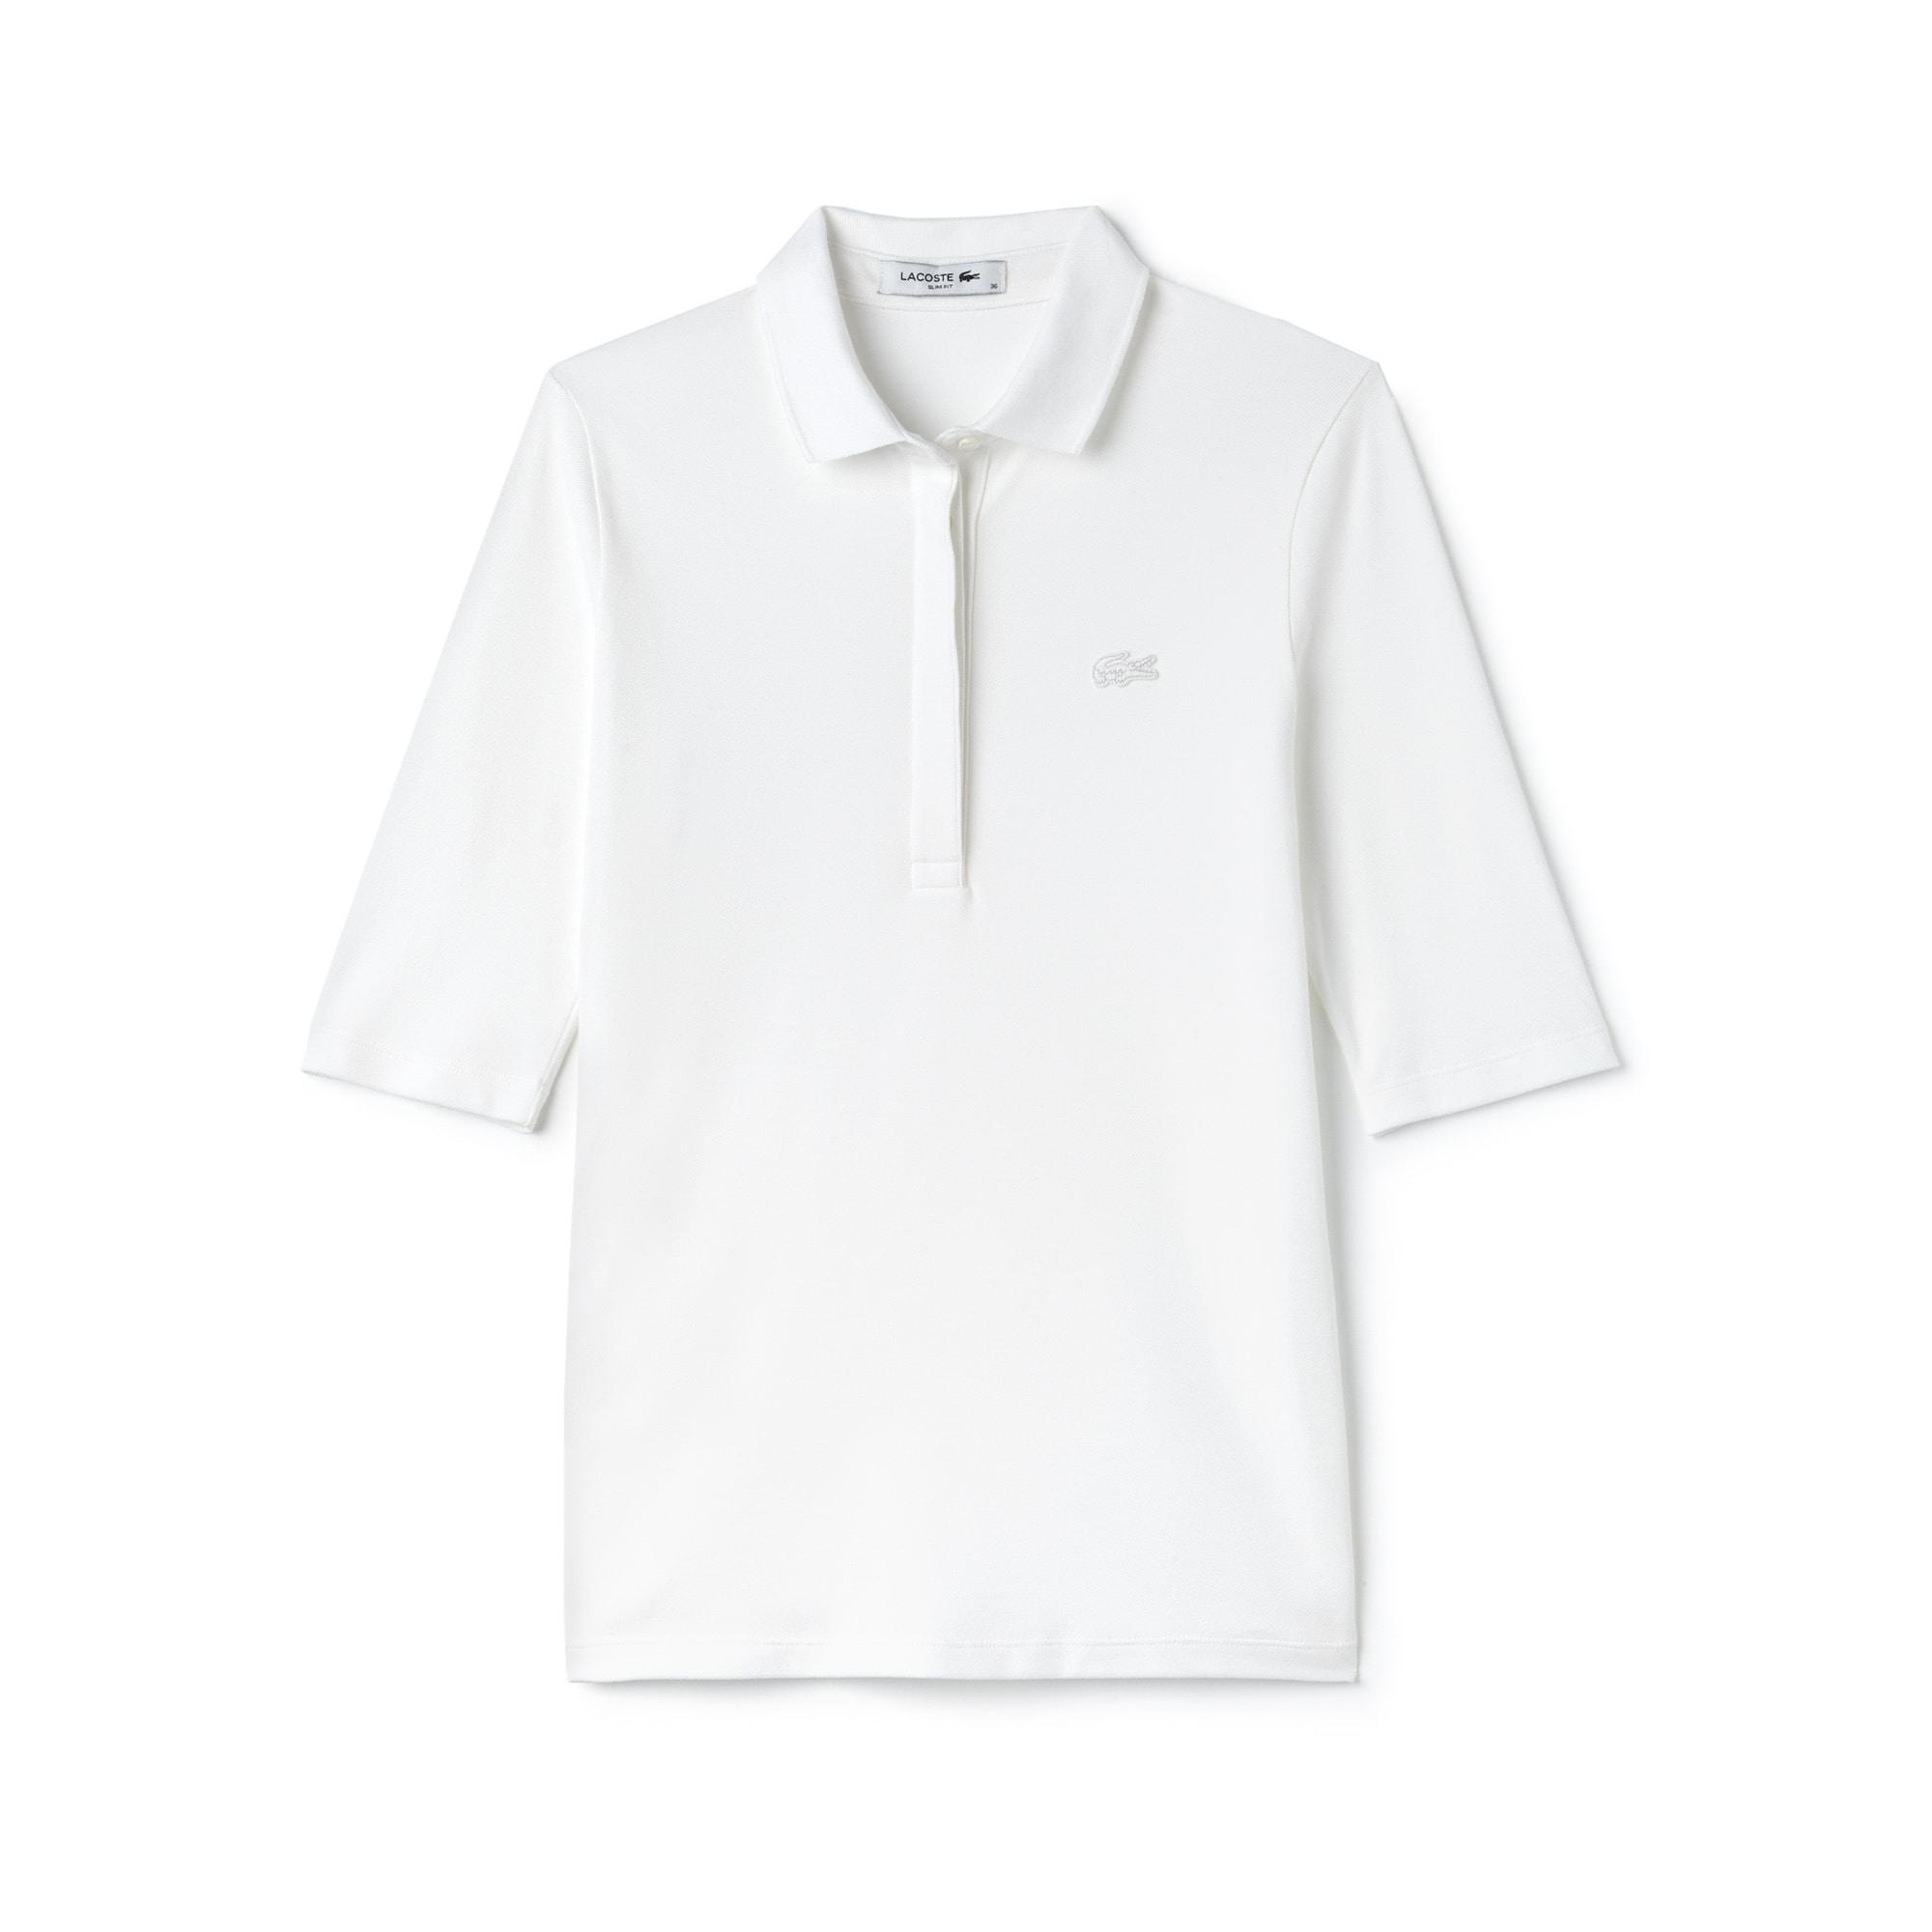 Lacoste女士修身版弹力迷你凸纹网眼面料Polo衬衫